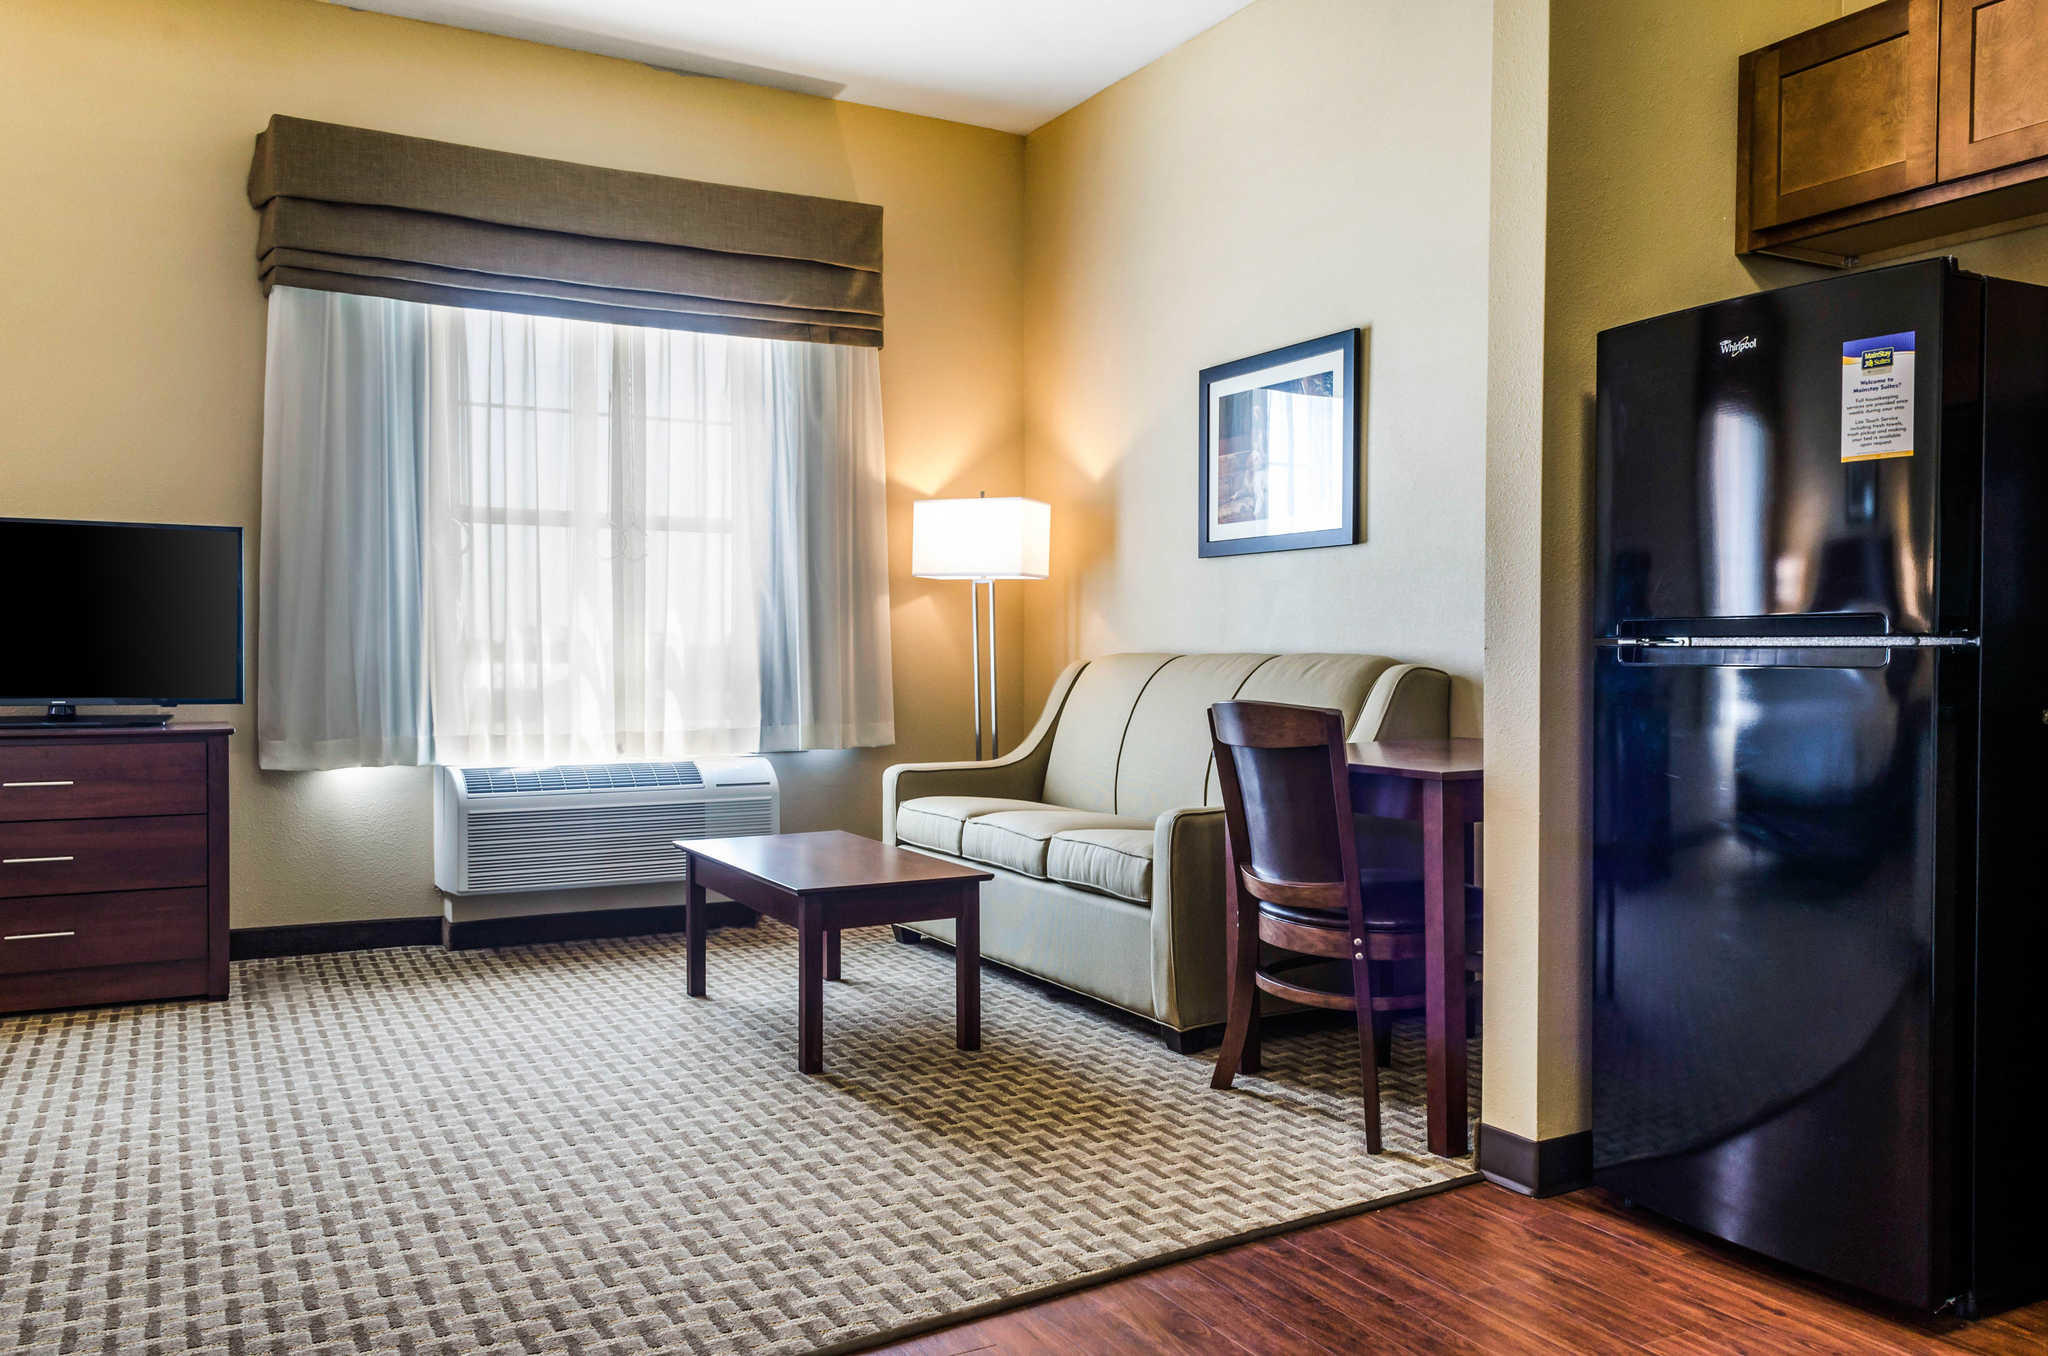 MainStay Suites Hackberry Sportsman's Lodge image 22